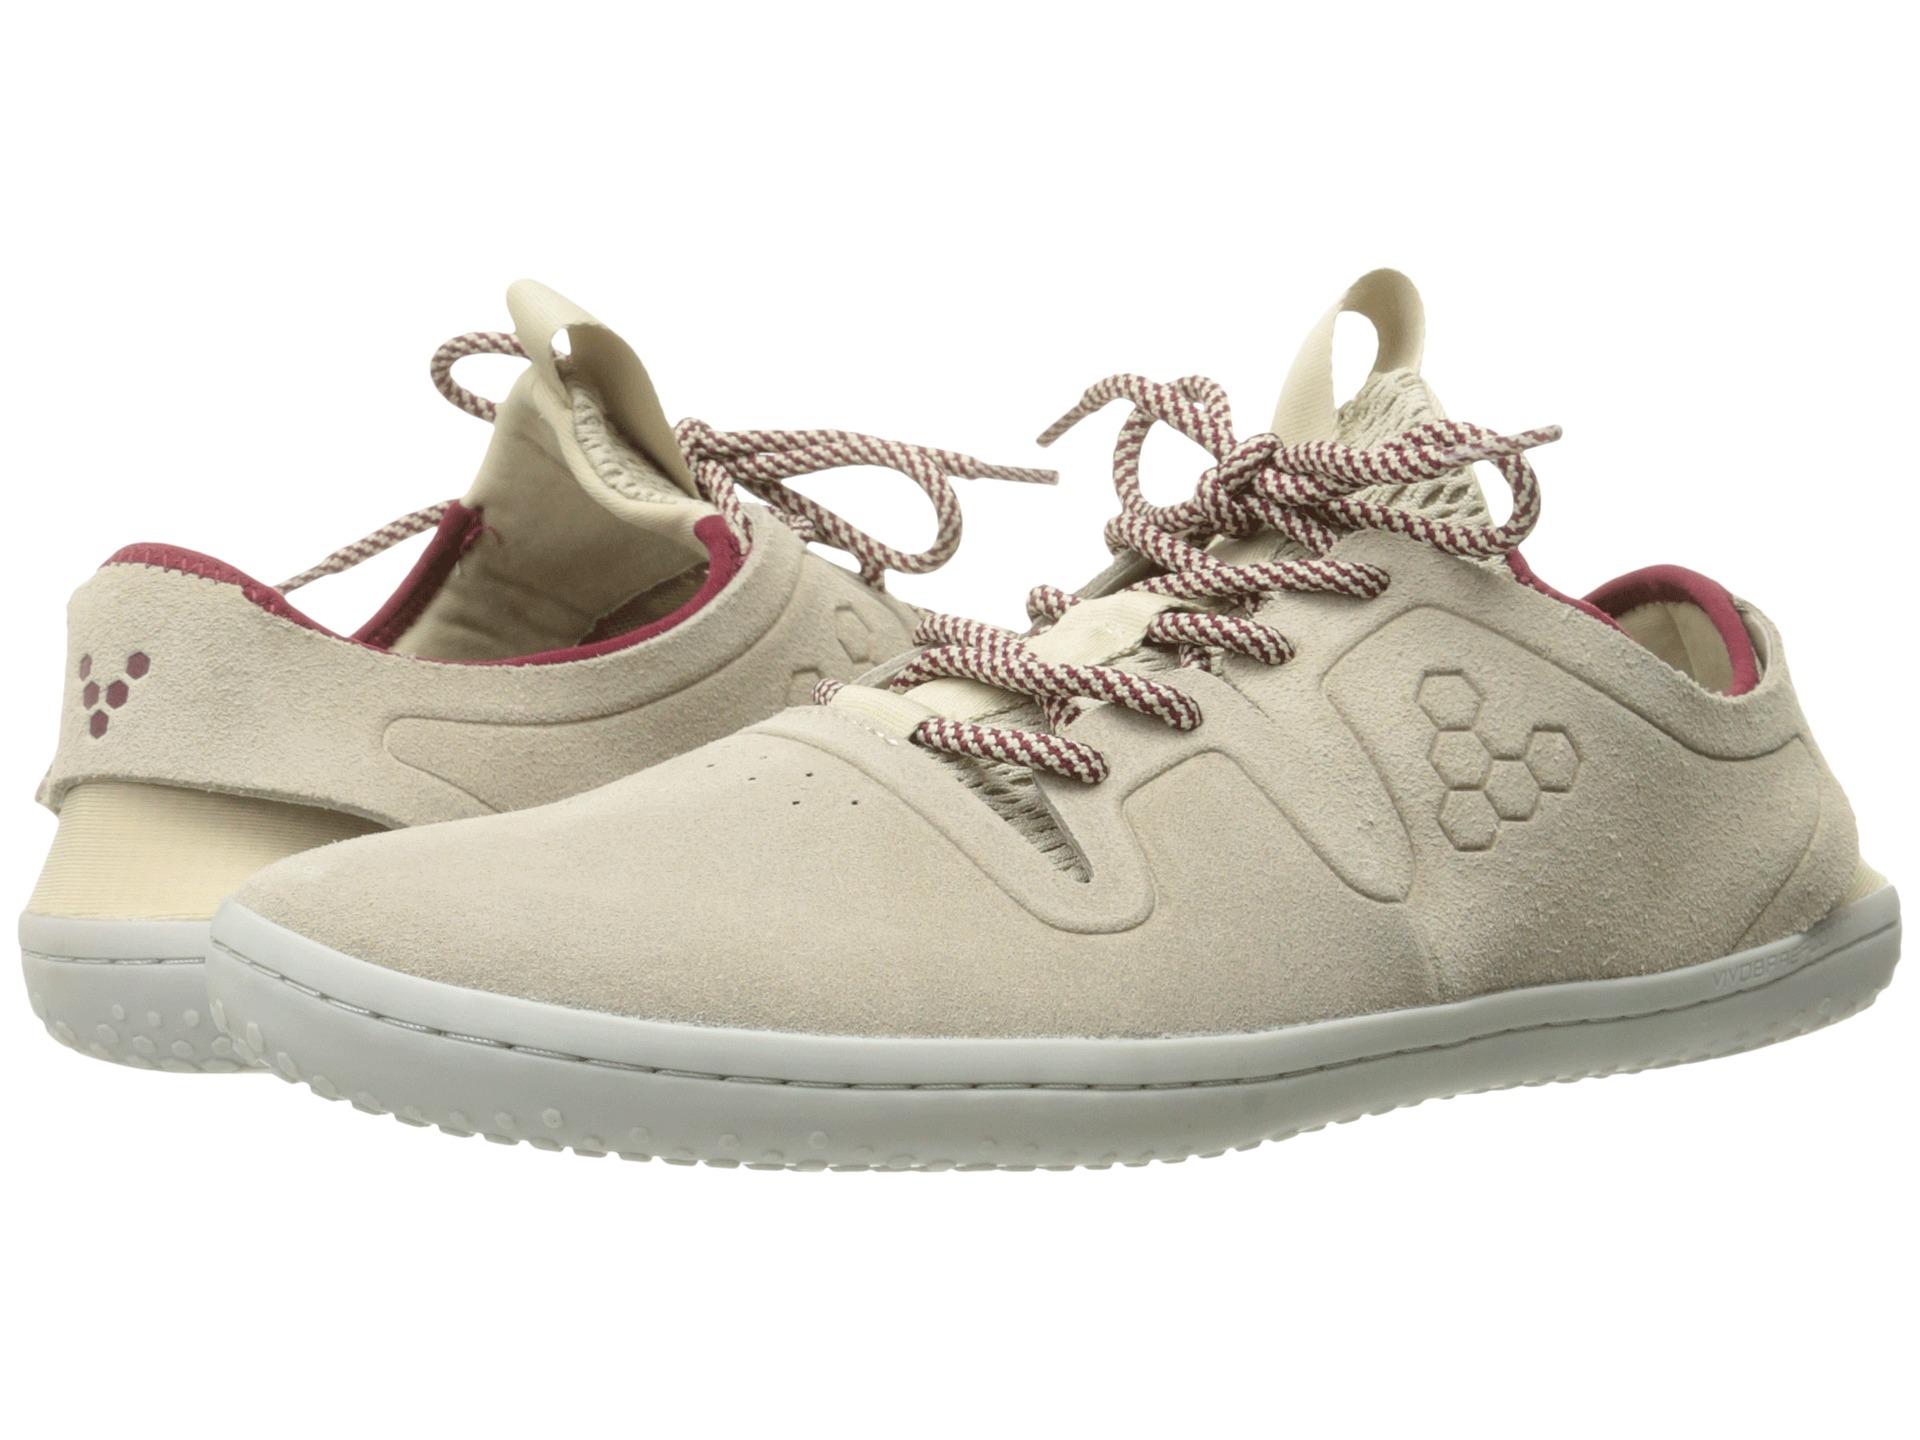 Clarks Sensory Shoes